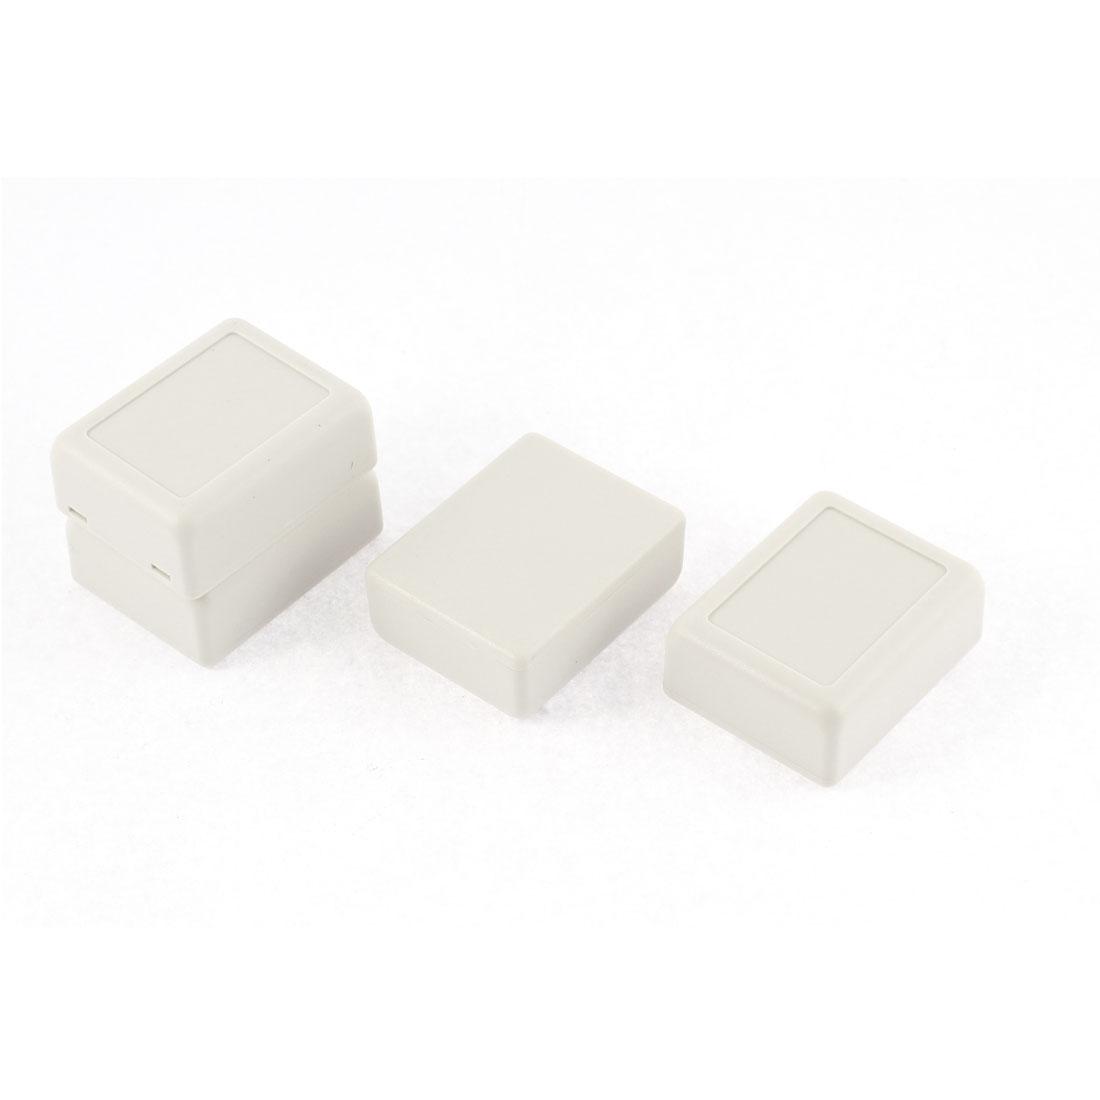 46mmx36mmx18mm Dustproof IP65 Plastic Enclosure Case DIY Junction Box 4 Pcs